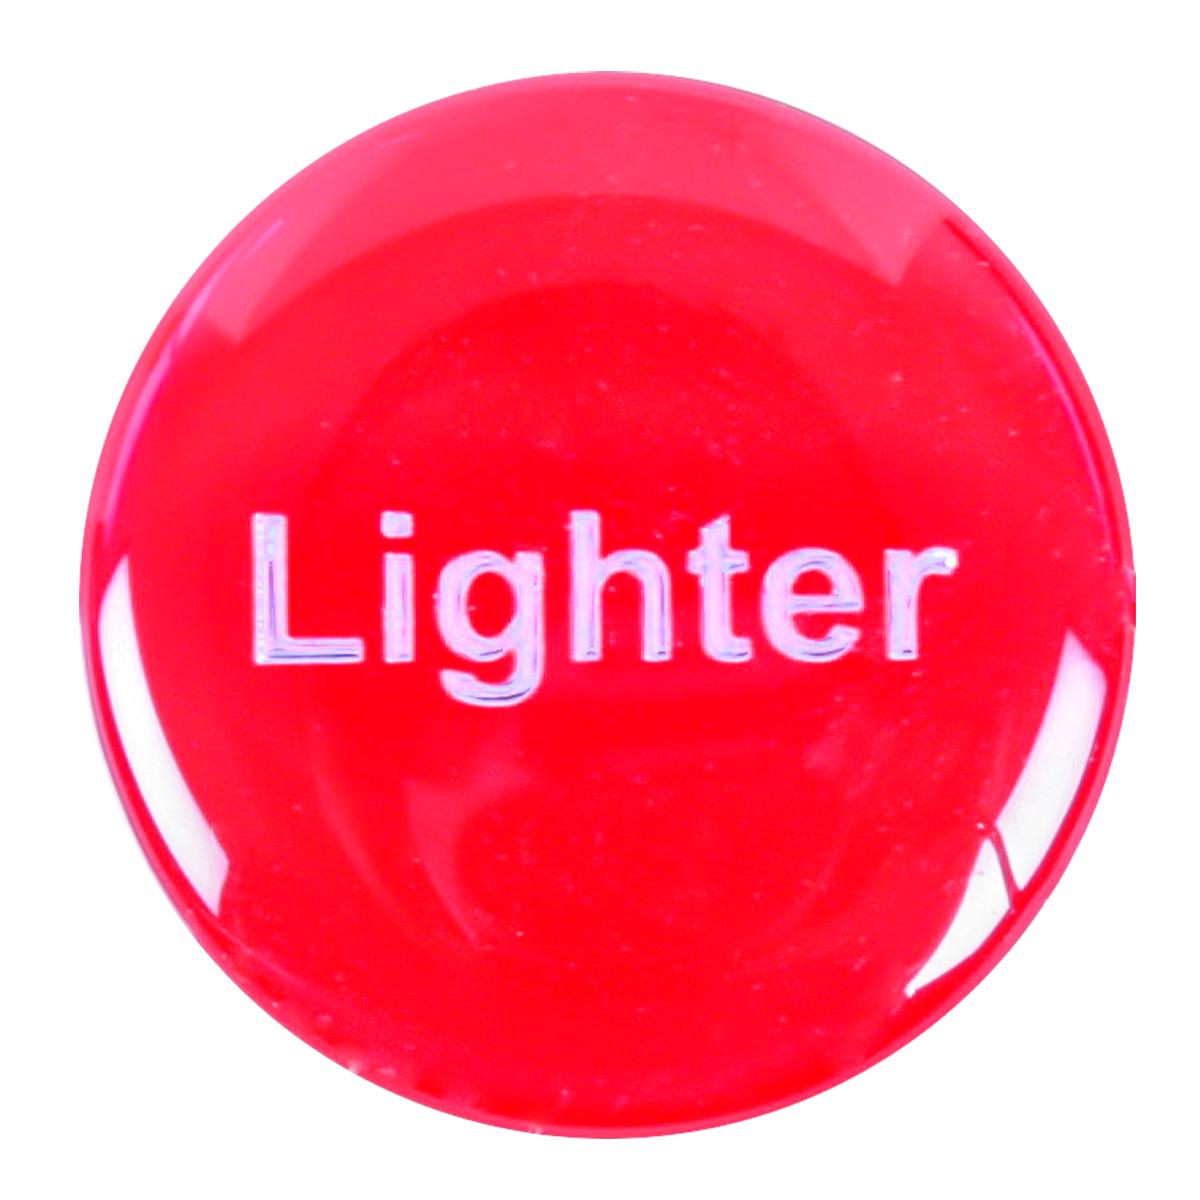 96255 Red Sticker for Cigarette Lighter Knob